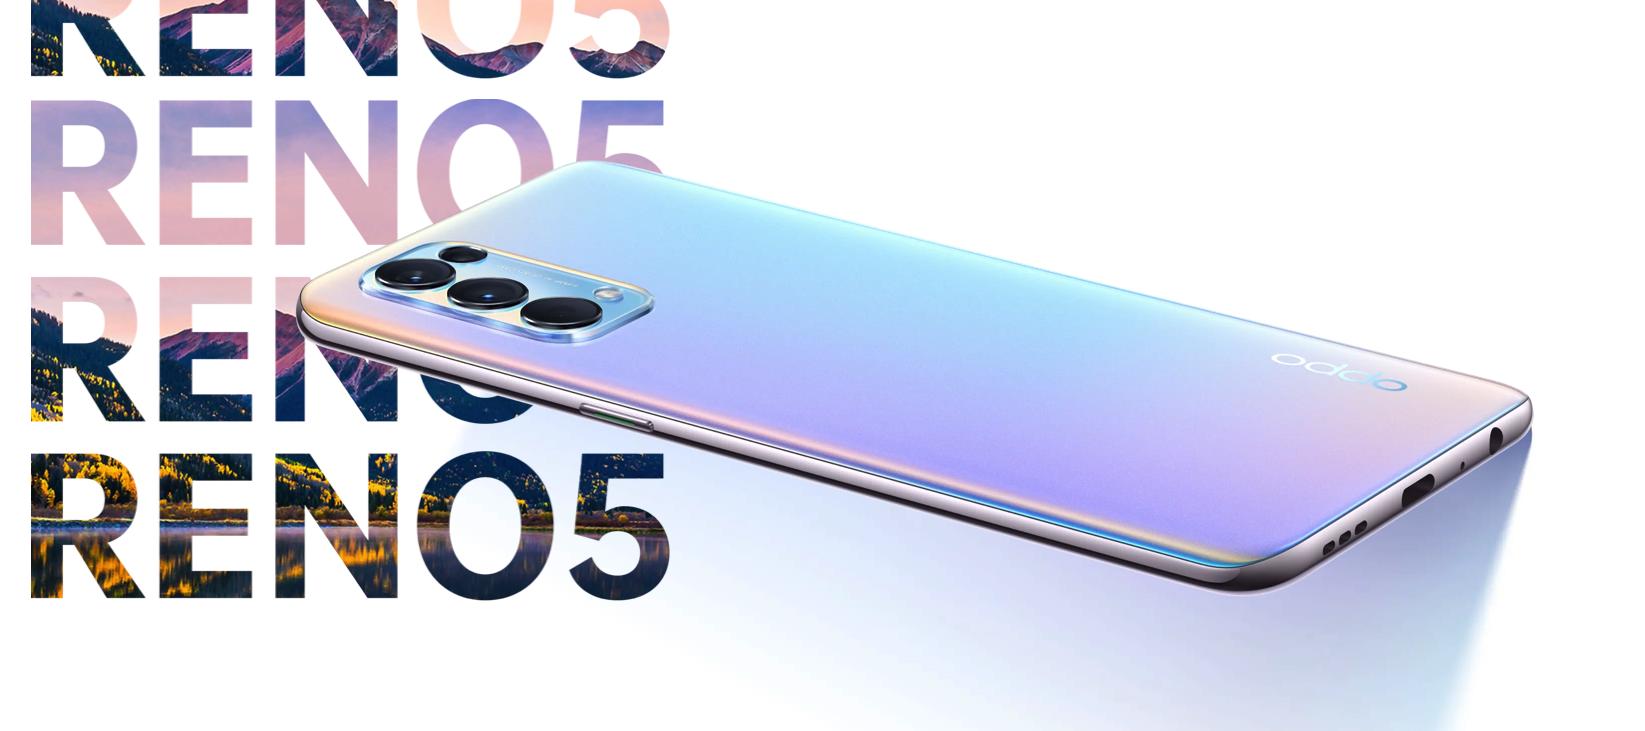 OPPO Reno 5 4G: 6.4-дюймовый AMOLED-дисплей на 90 Гц, чип Snapdragon 720G, квадро-камера, Android 11 и ценник в $377